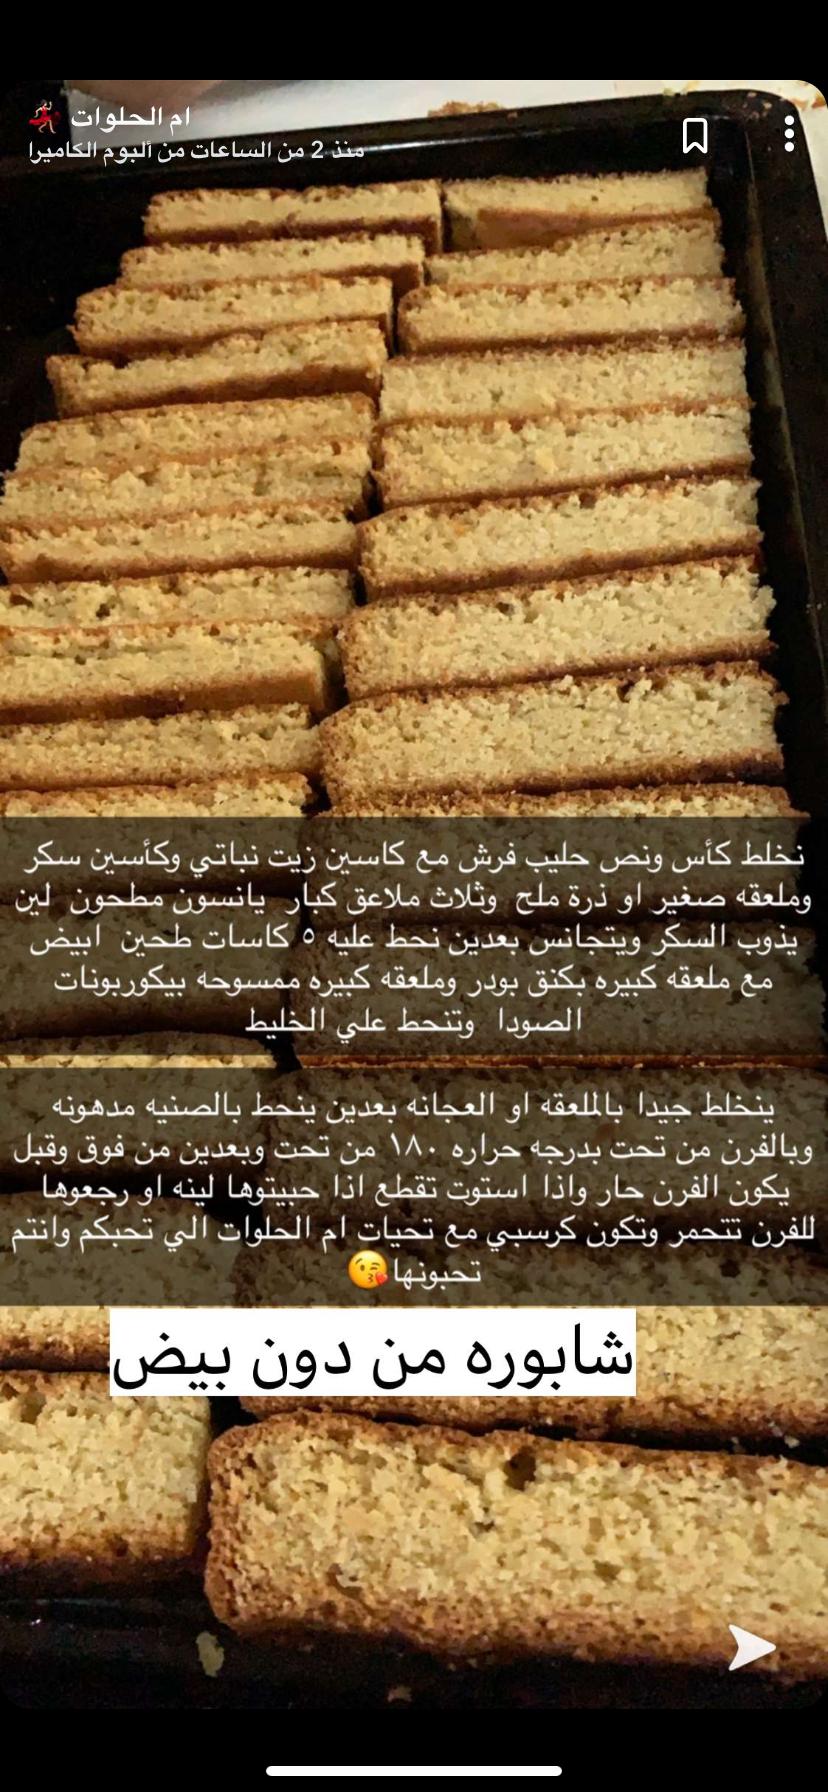 Pin By Hana On معجنات سندوتشات Arabic Sweets Arabic Food Dessert Recipes